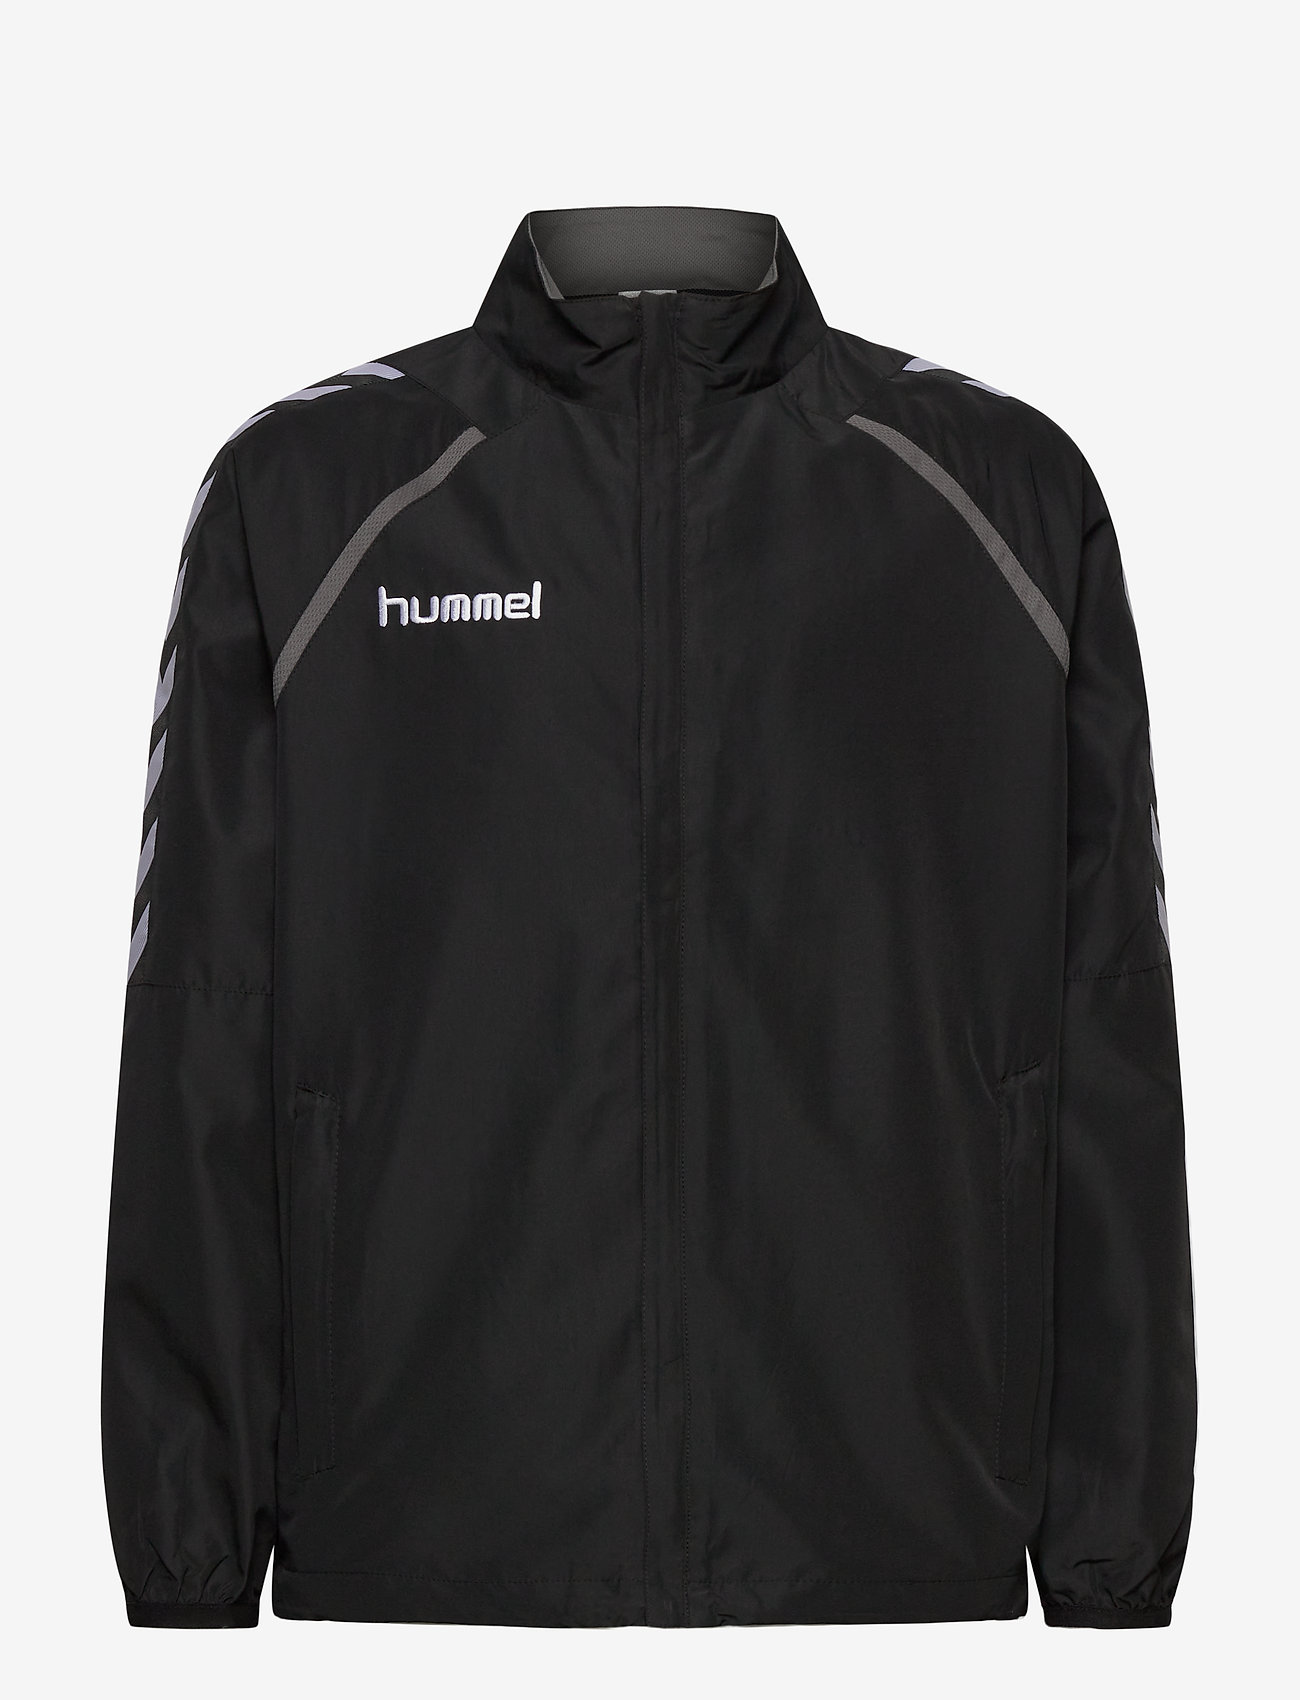 Hummel - STAY AUTHENTIC MICRO JACKET - windbreaker - black - 0